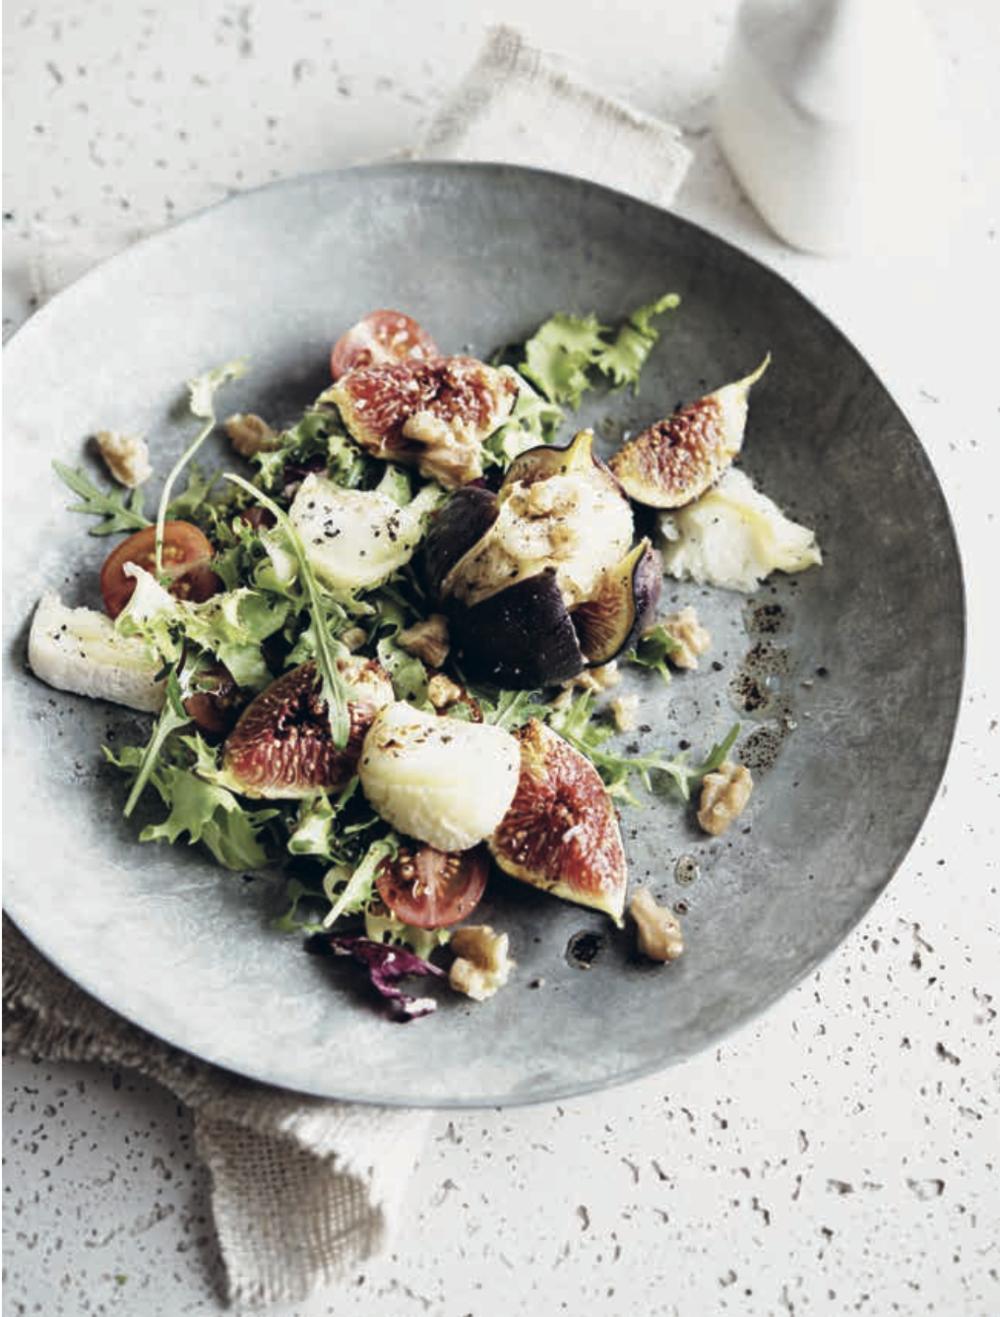 Salade de fromage de chèvre grillé aux figues fraîches • Grilled goat cheese with fresh figs